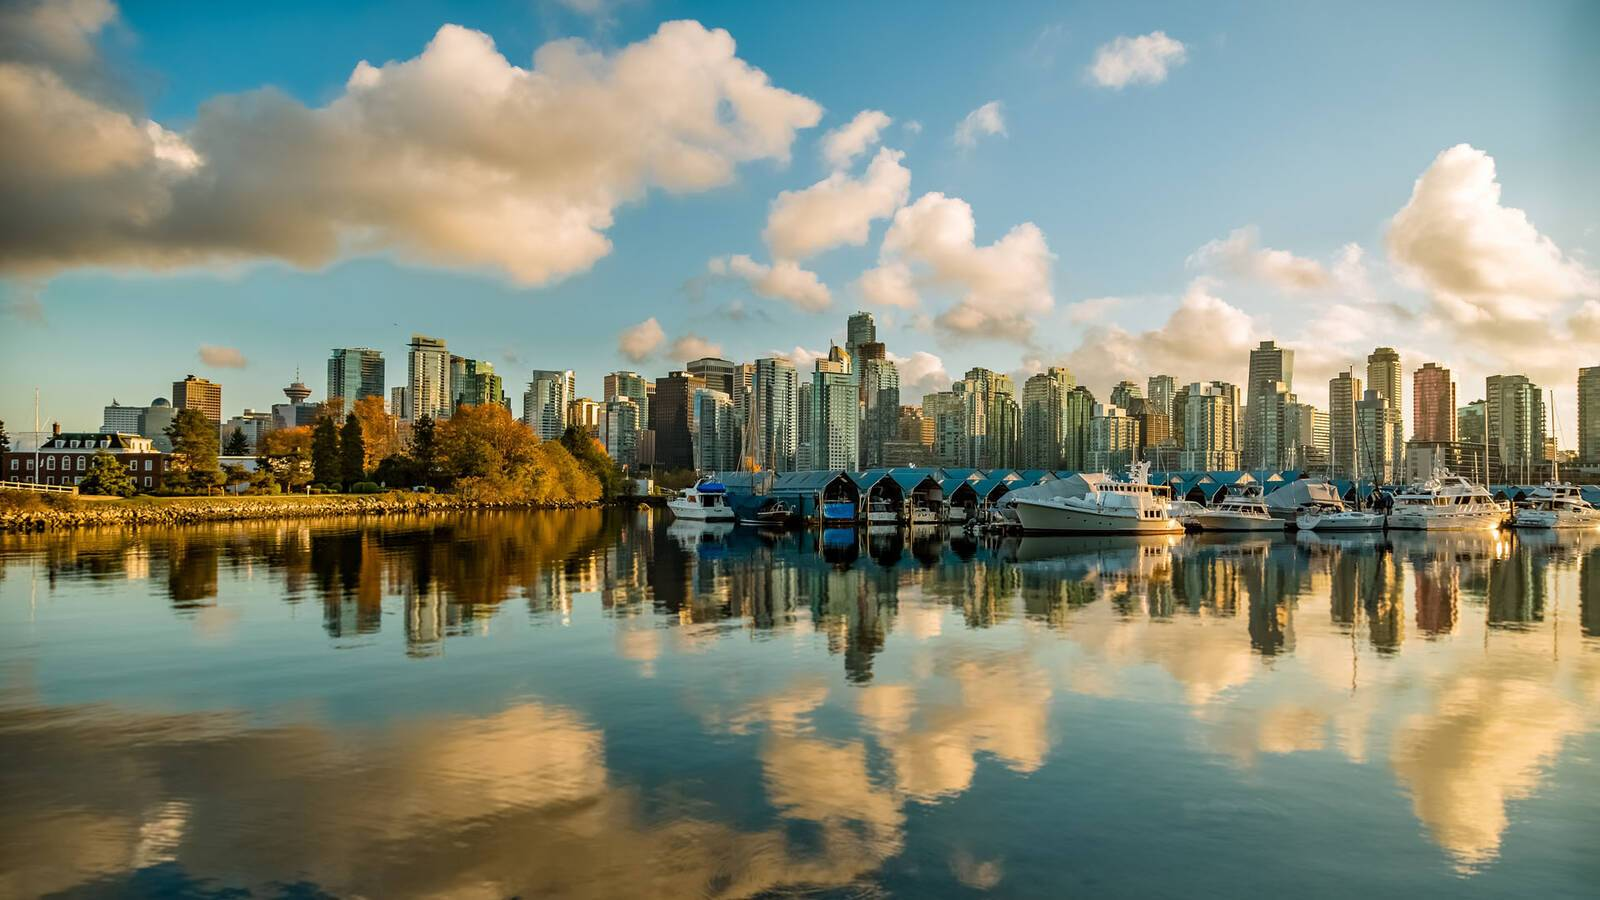 Vancouver mike benna WHHY iBp3aI unsplash